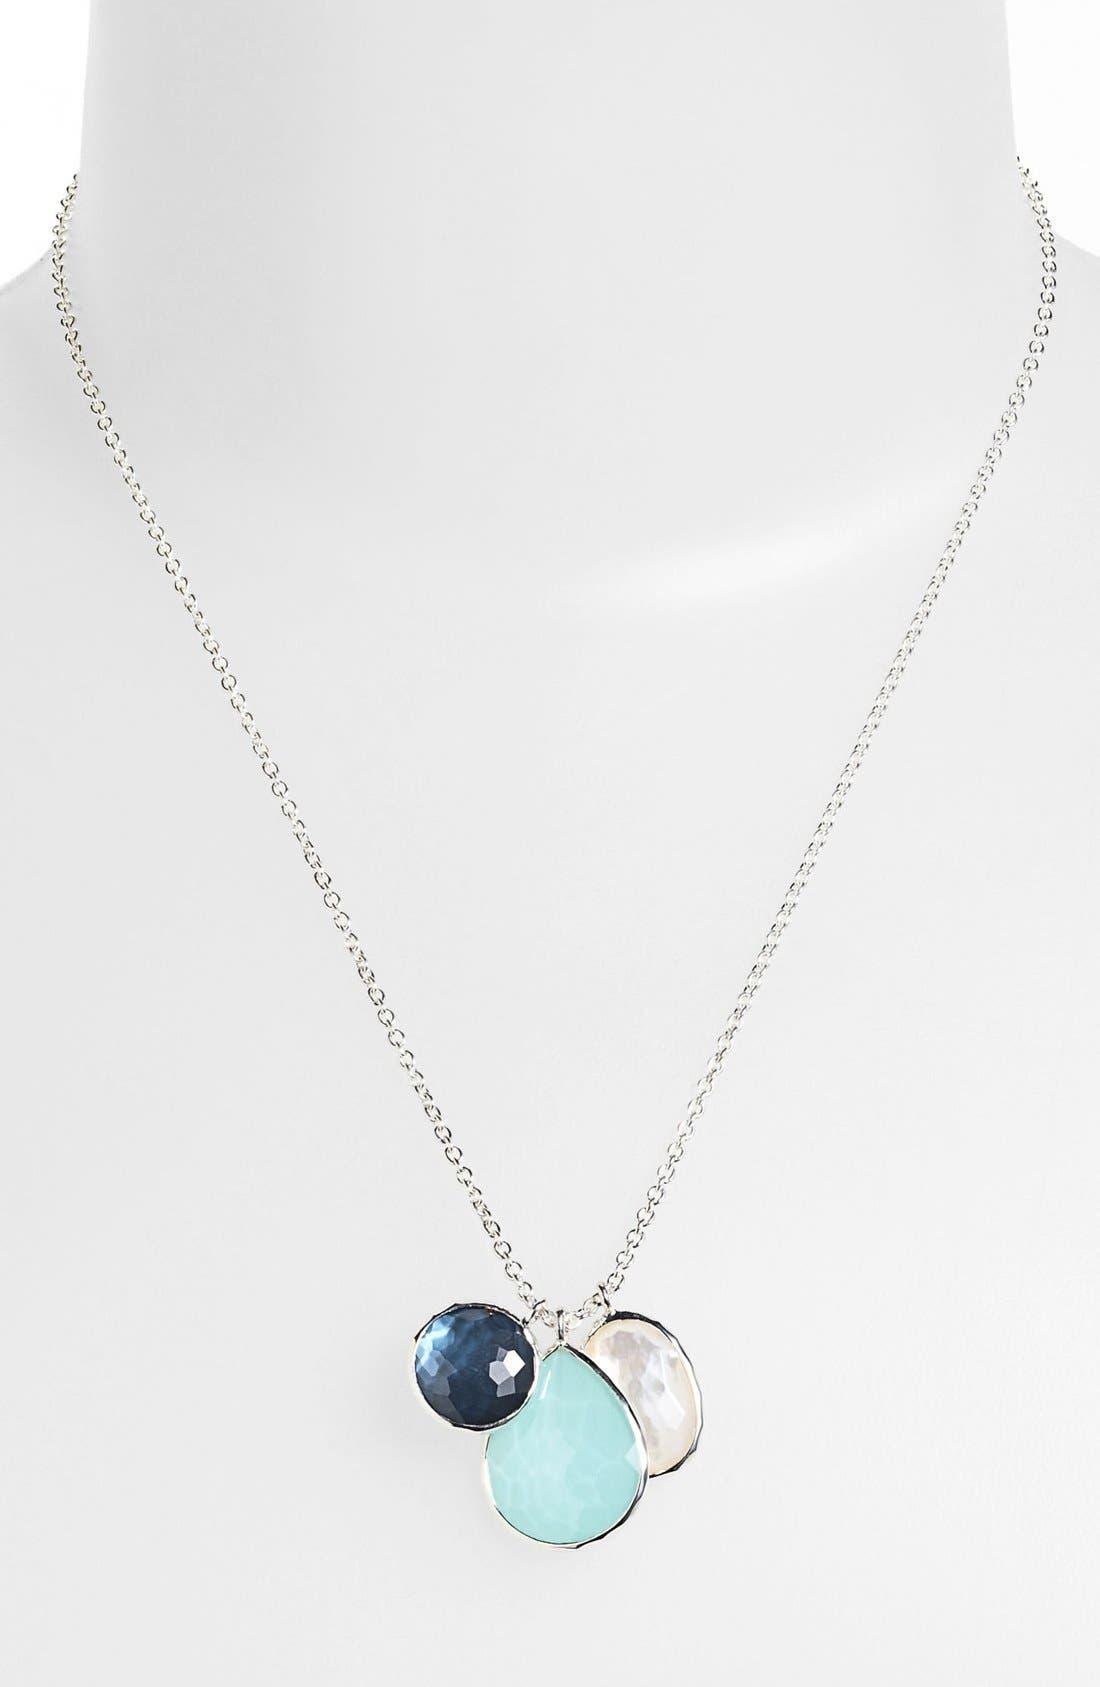 Alternate Image 1 Selected - Ippolita 'Wonderland' Triple Charm Necklace